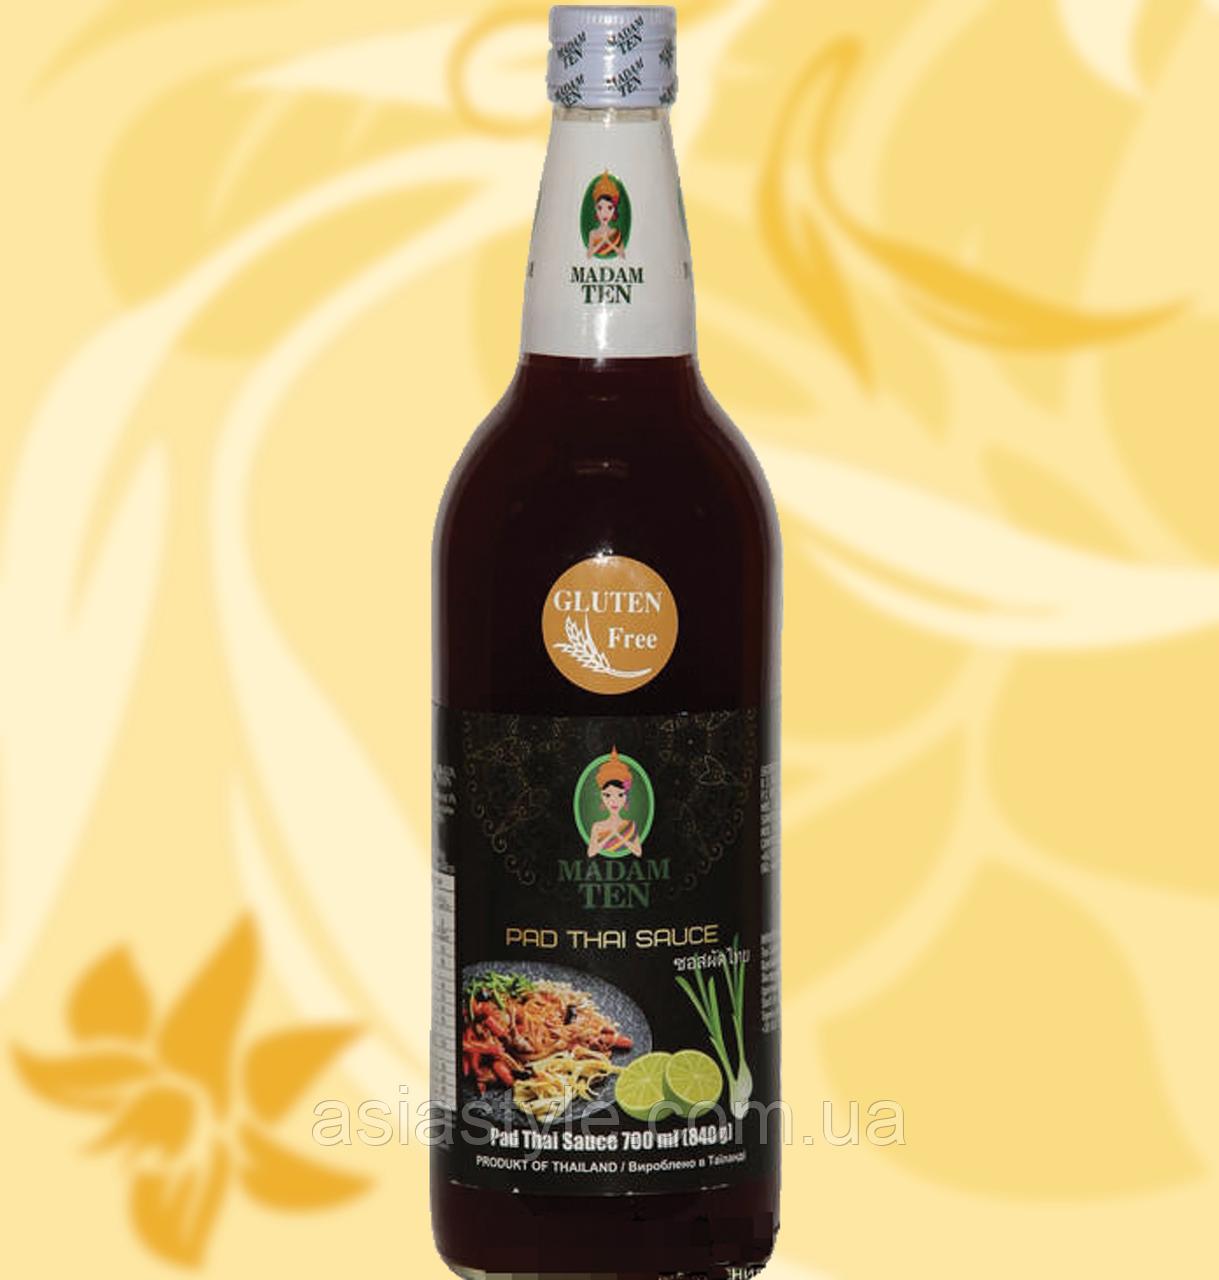 Соус Пад Тай, Pad Thai Sauce, Ten Madam, 700 мл, Ст